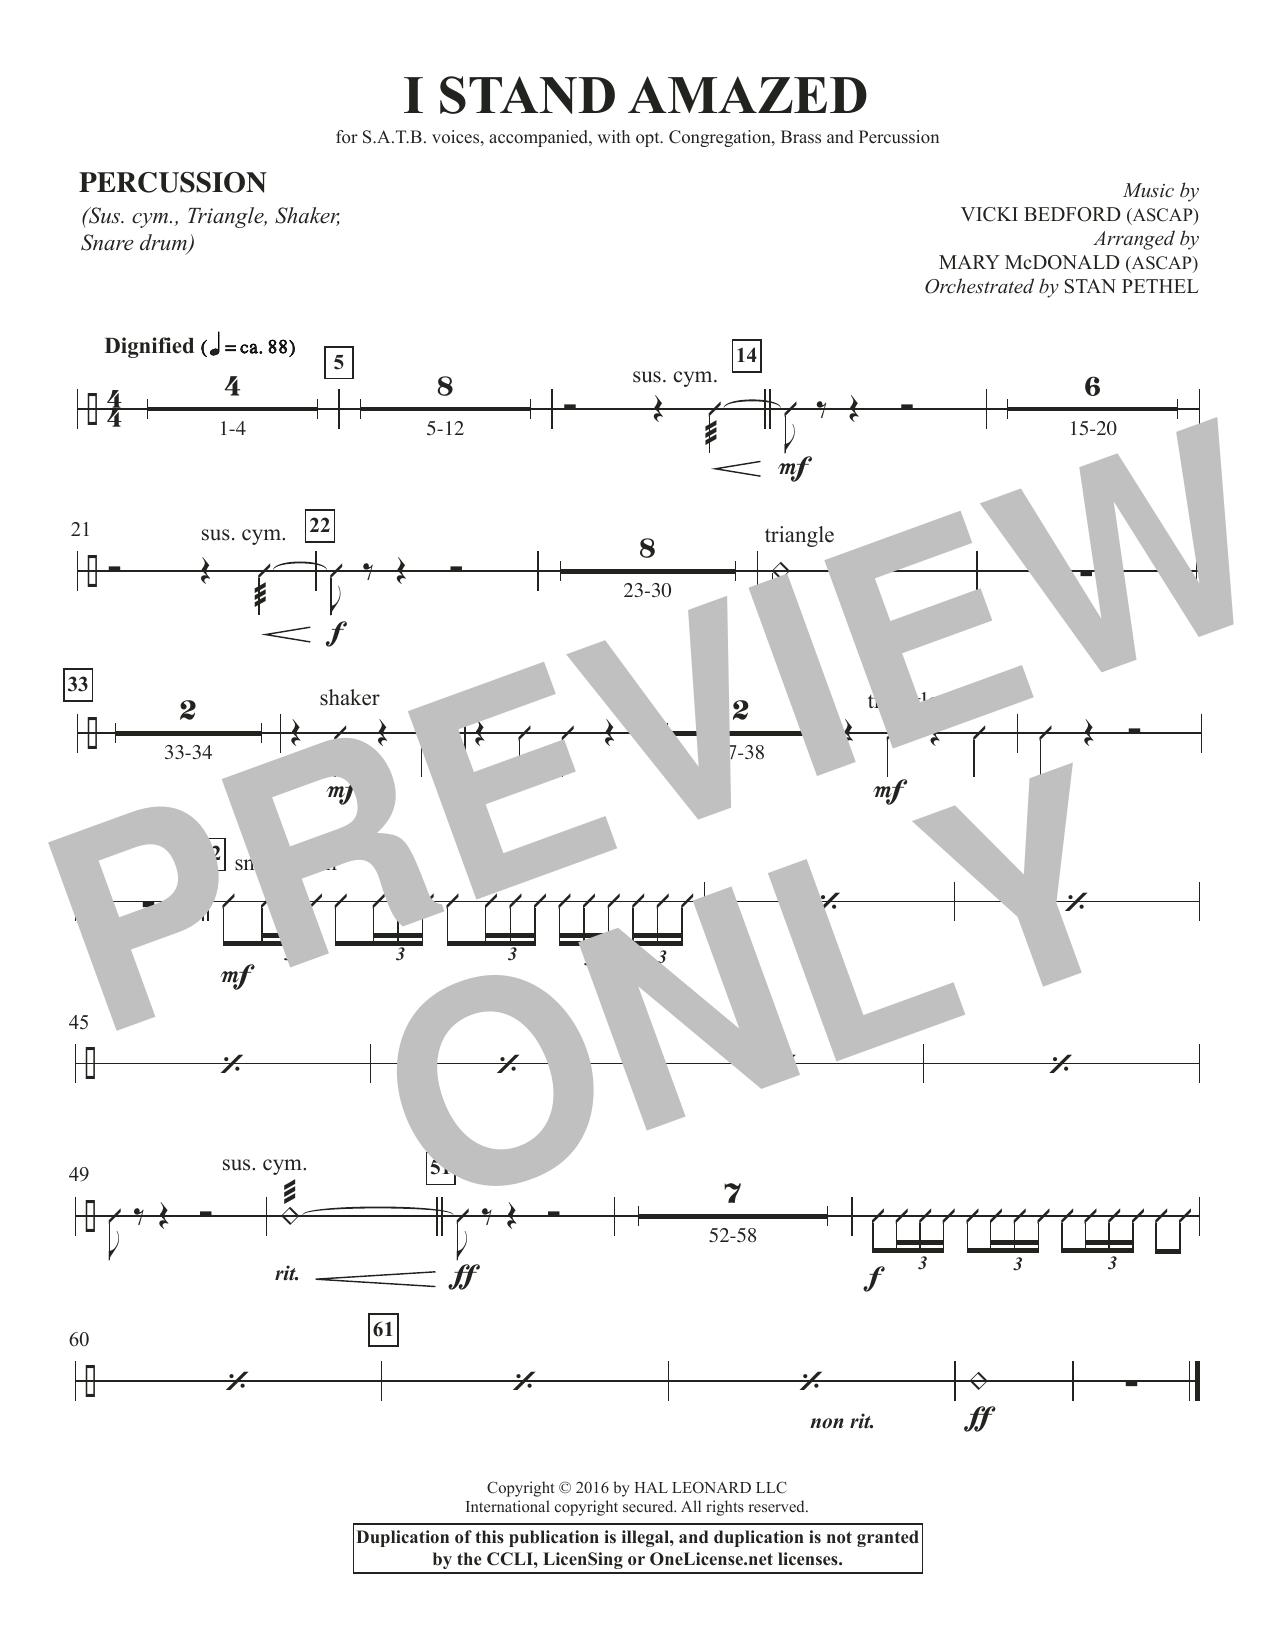 I Stand Amazed - Percussion Sheet Music